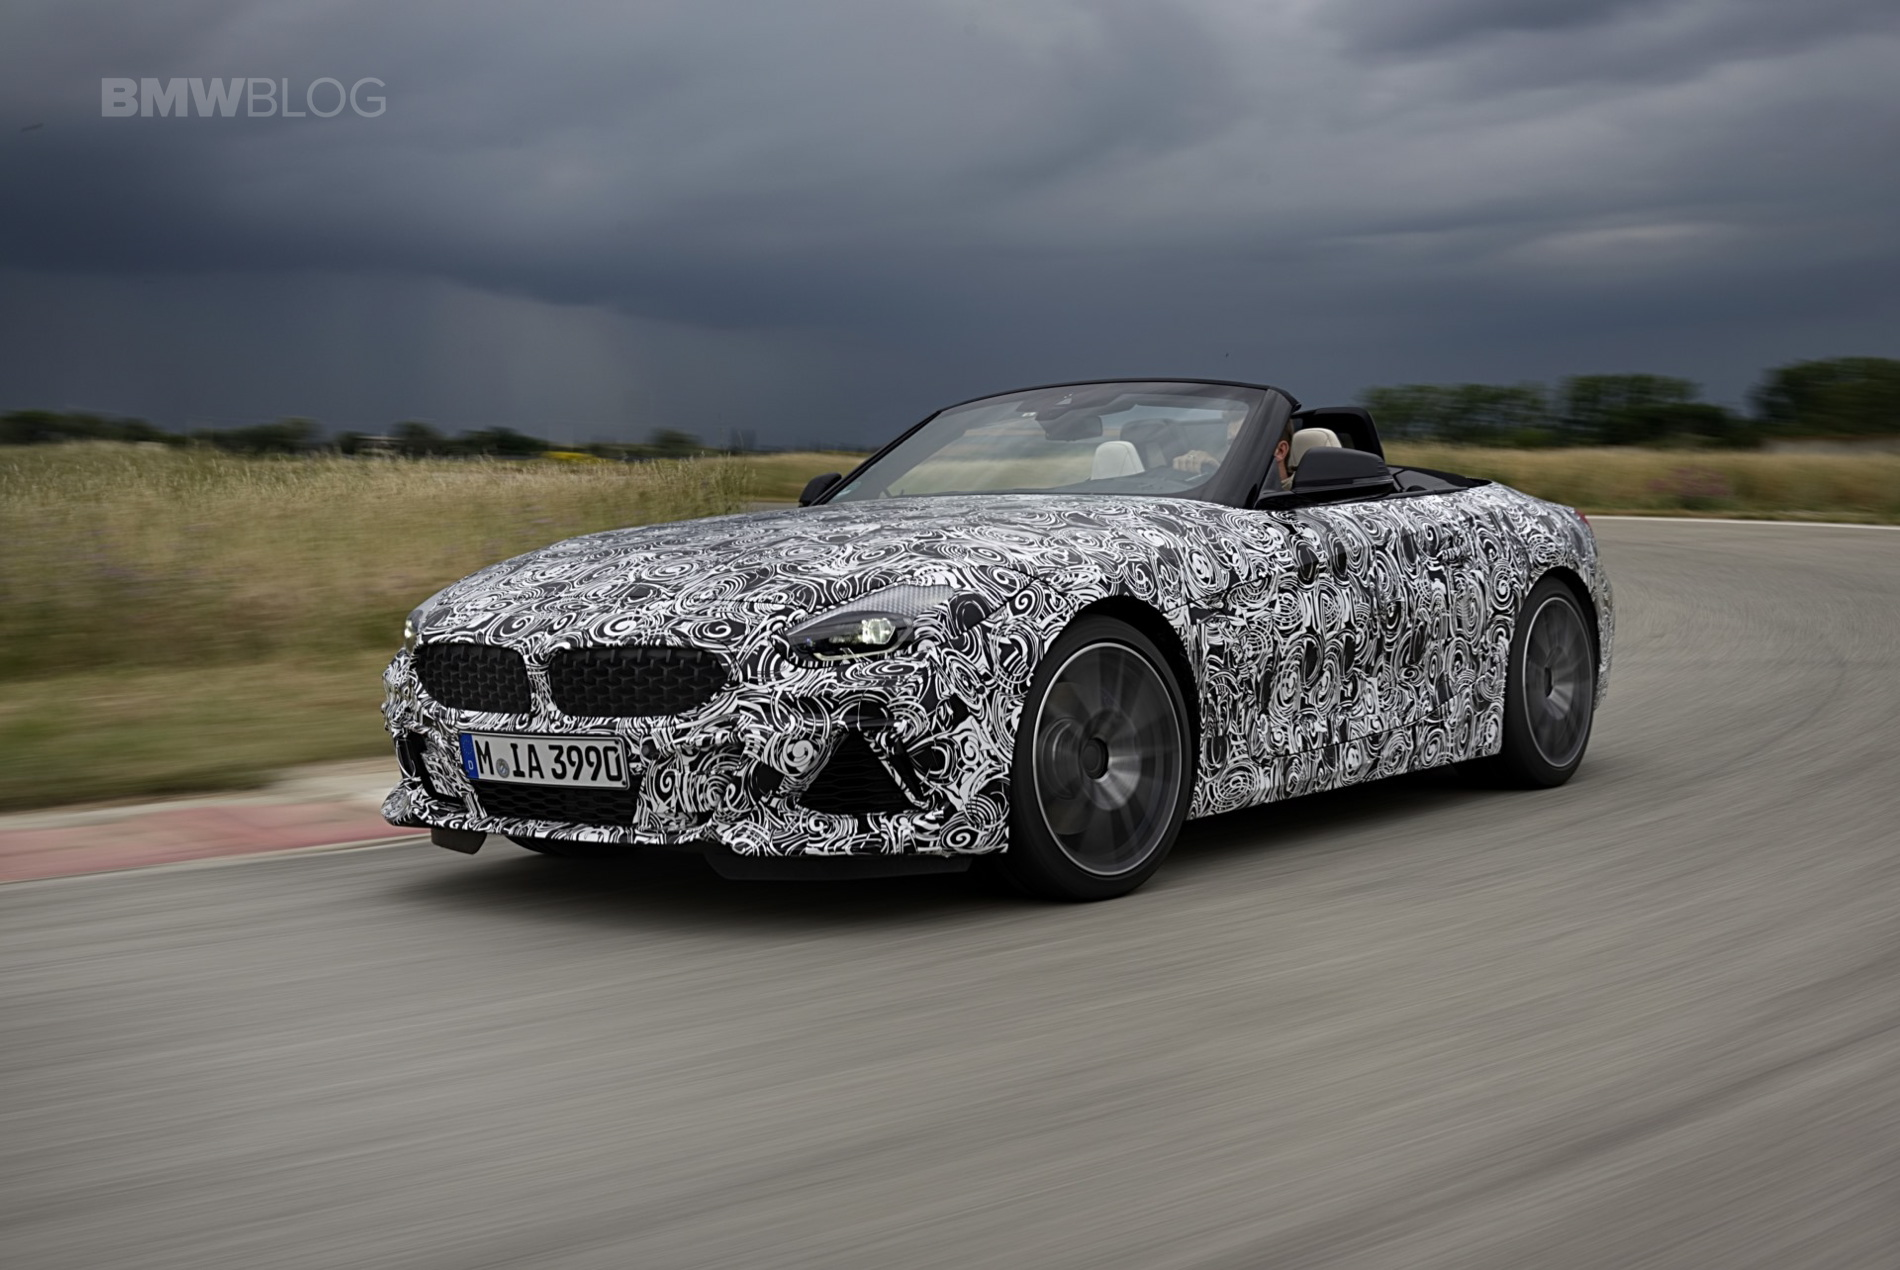 BMW G29 Z4 pre drive 11